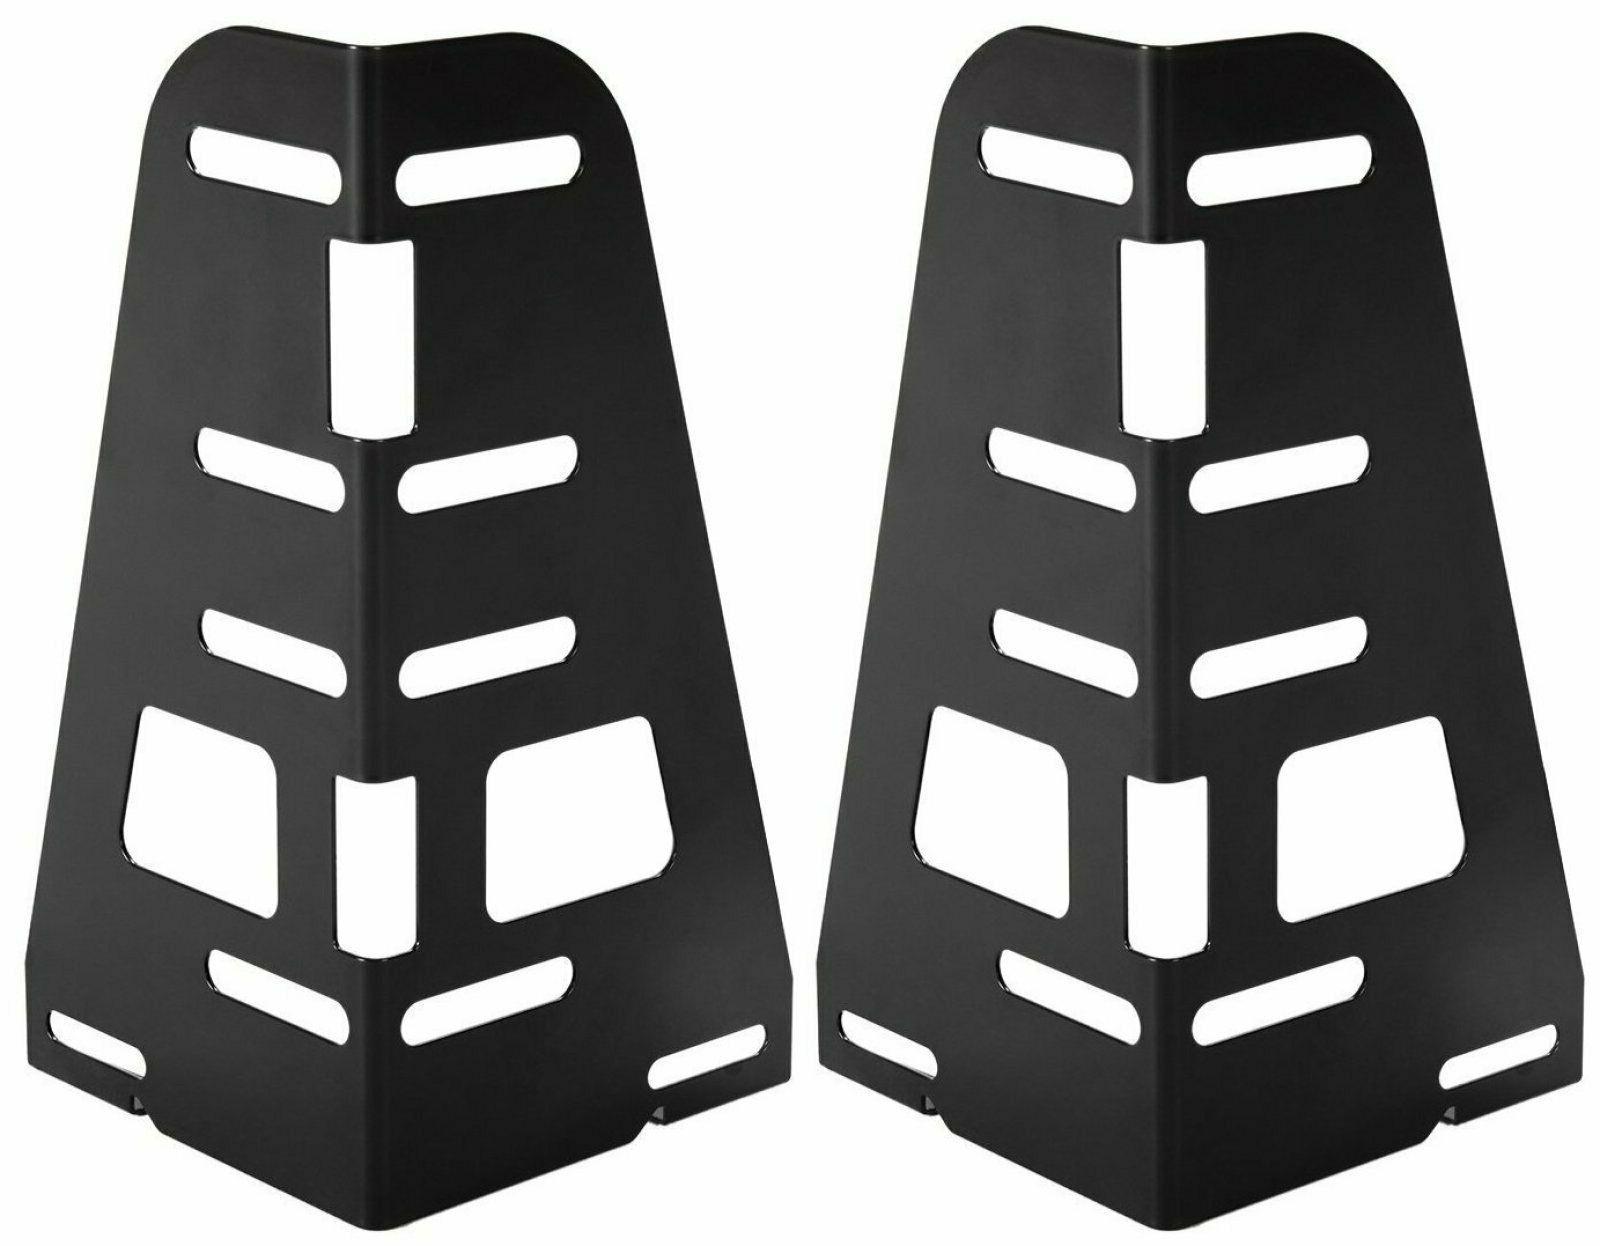 New Zinus Sleep Master Headboard Bracket Set